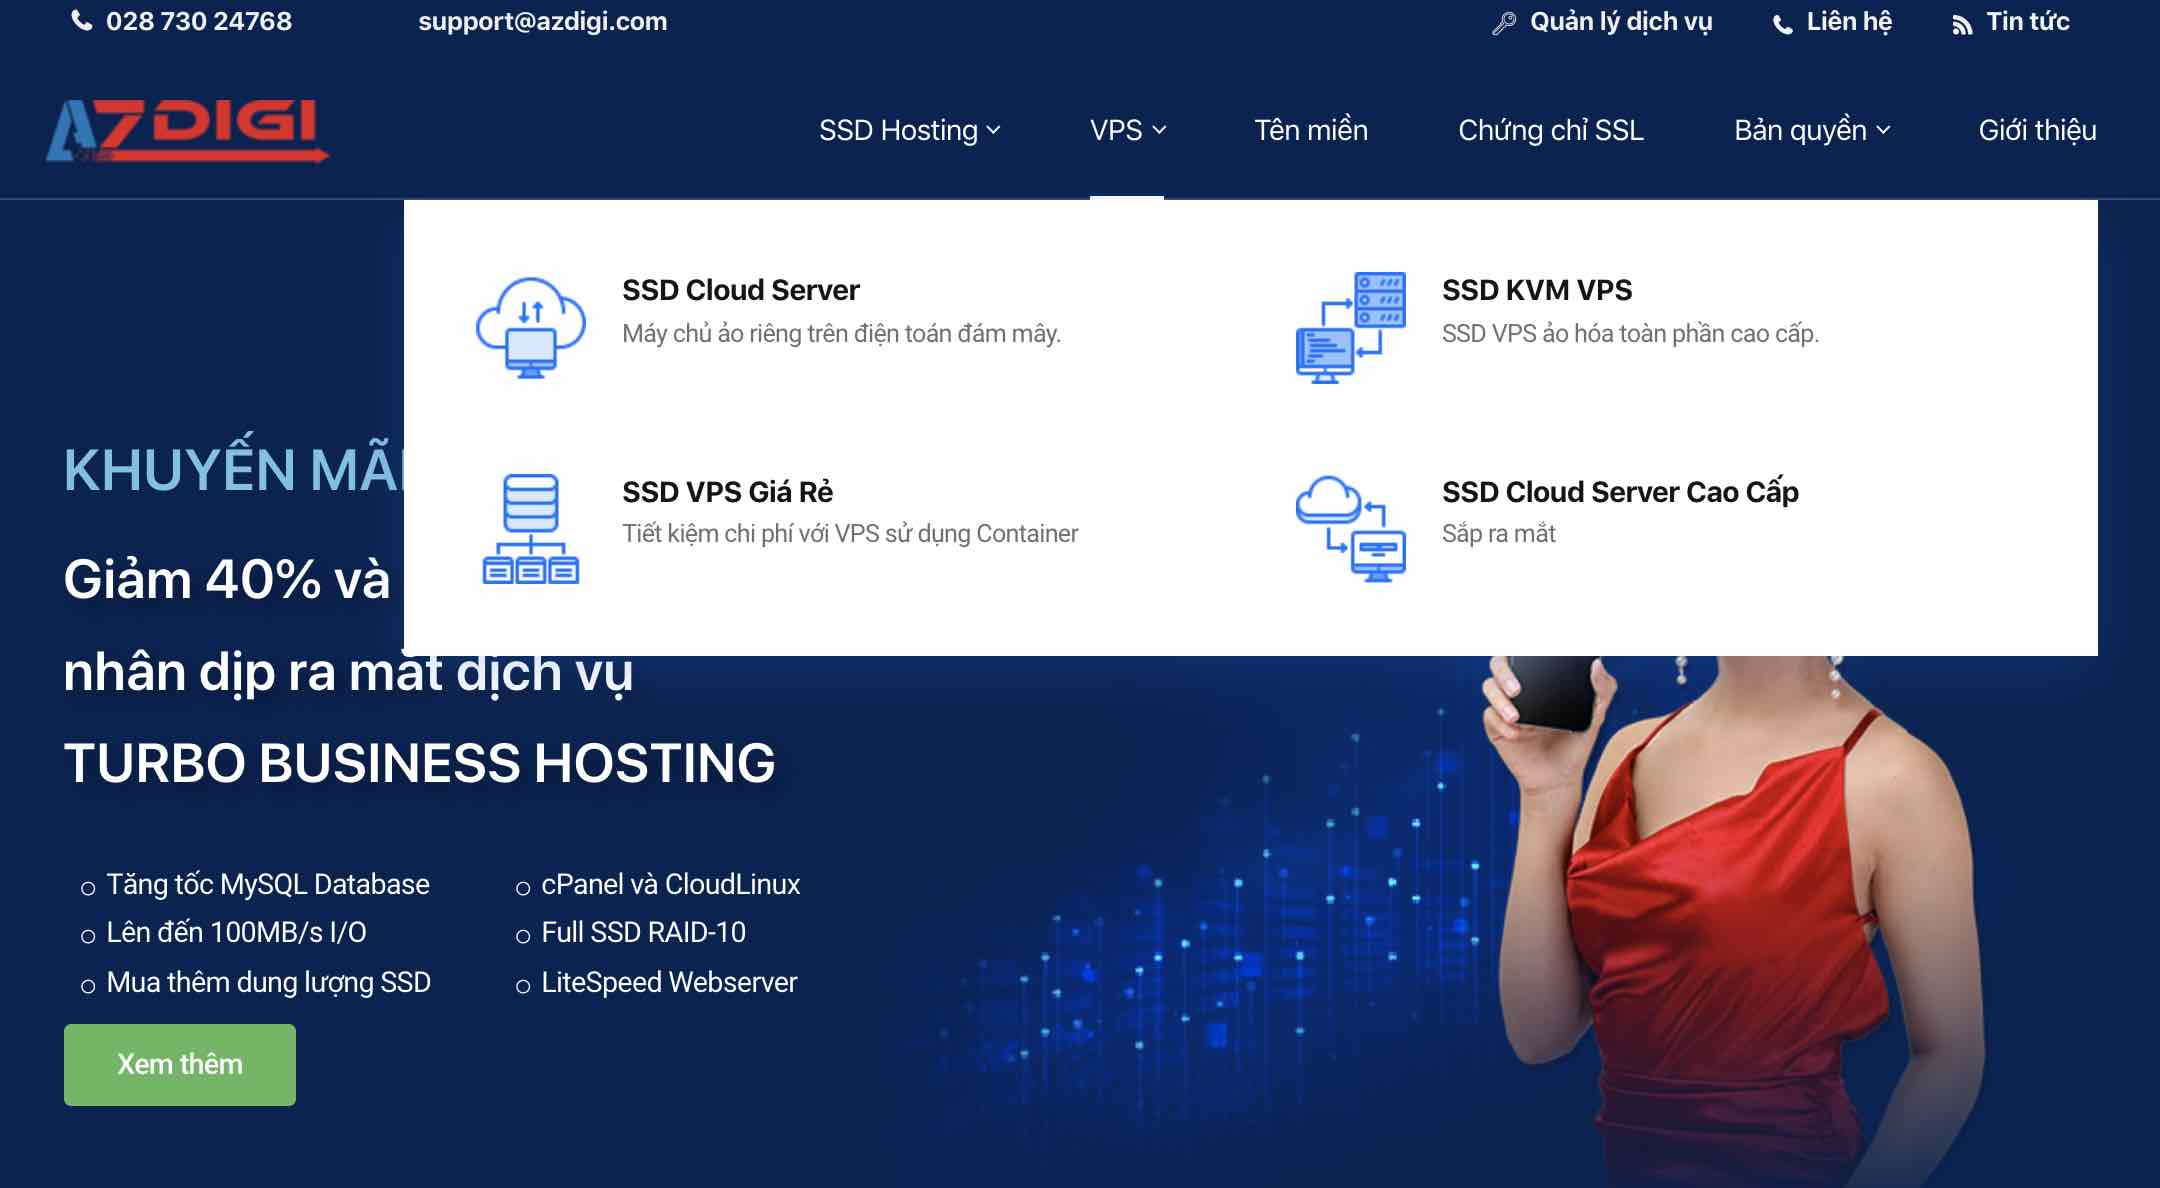 vps azdigi homepage